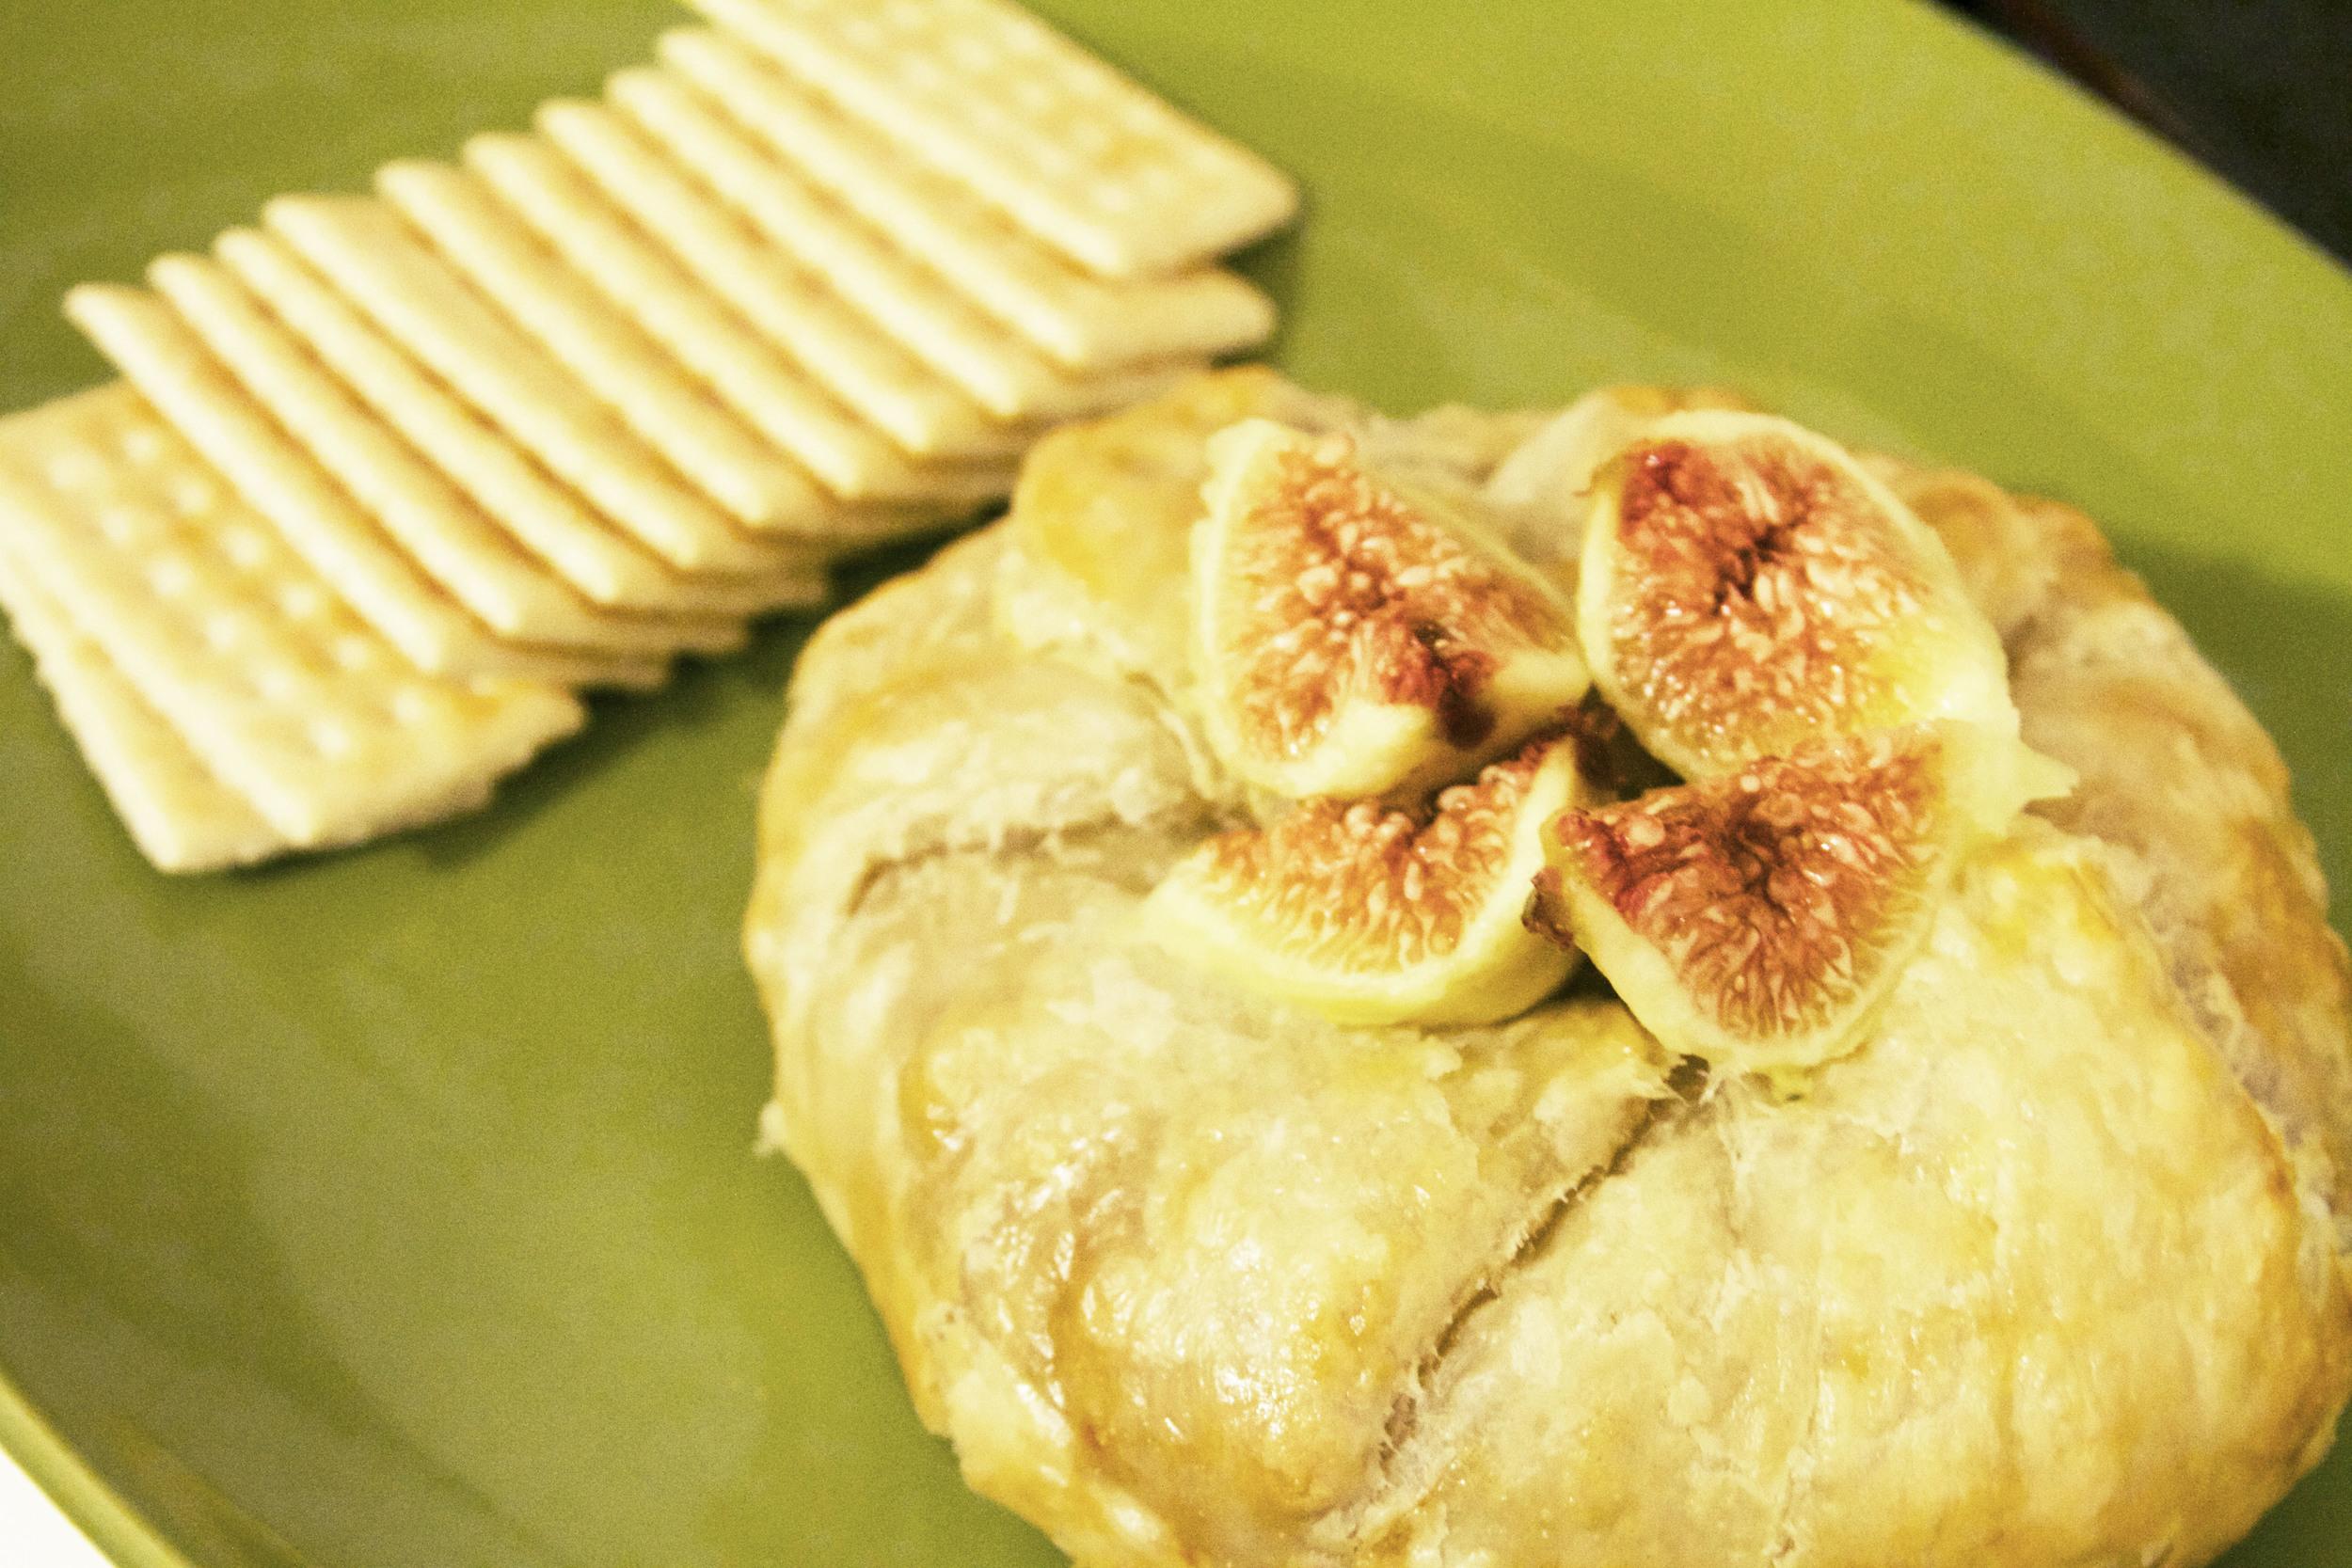 baked brie.jpg